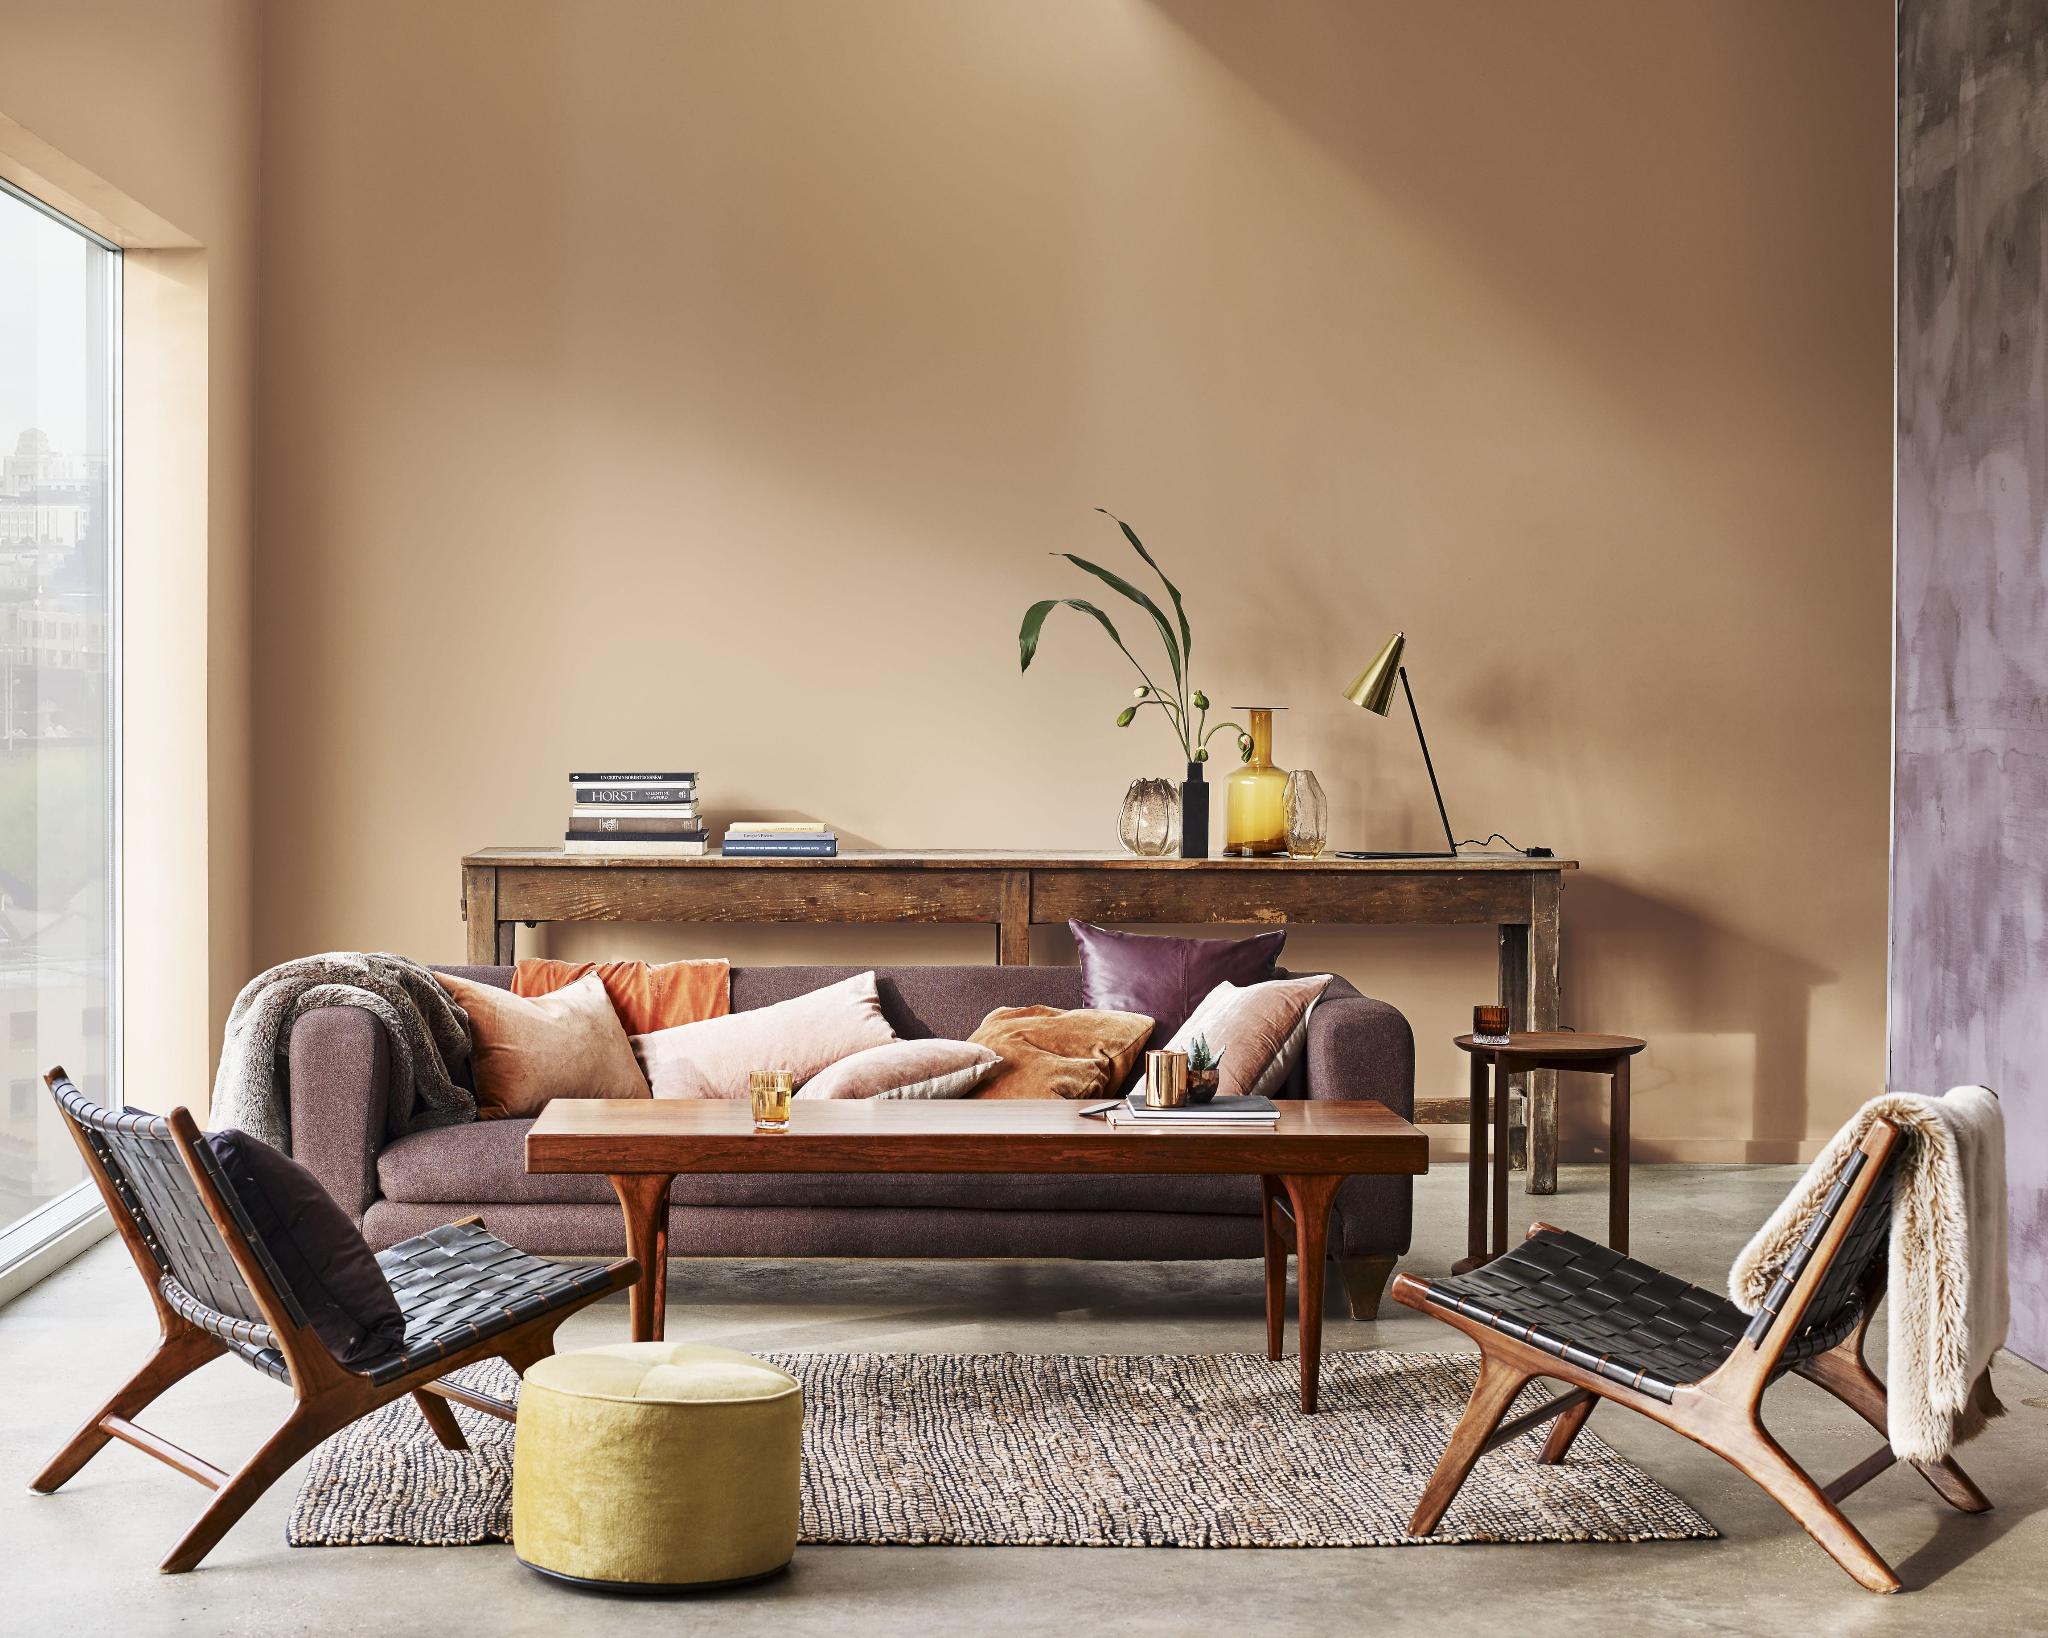 cf18_consumer_comforting_rye_livingroom2_1638-min.jpg